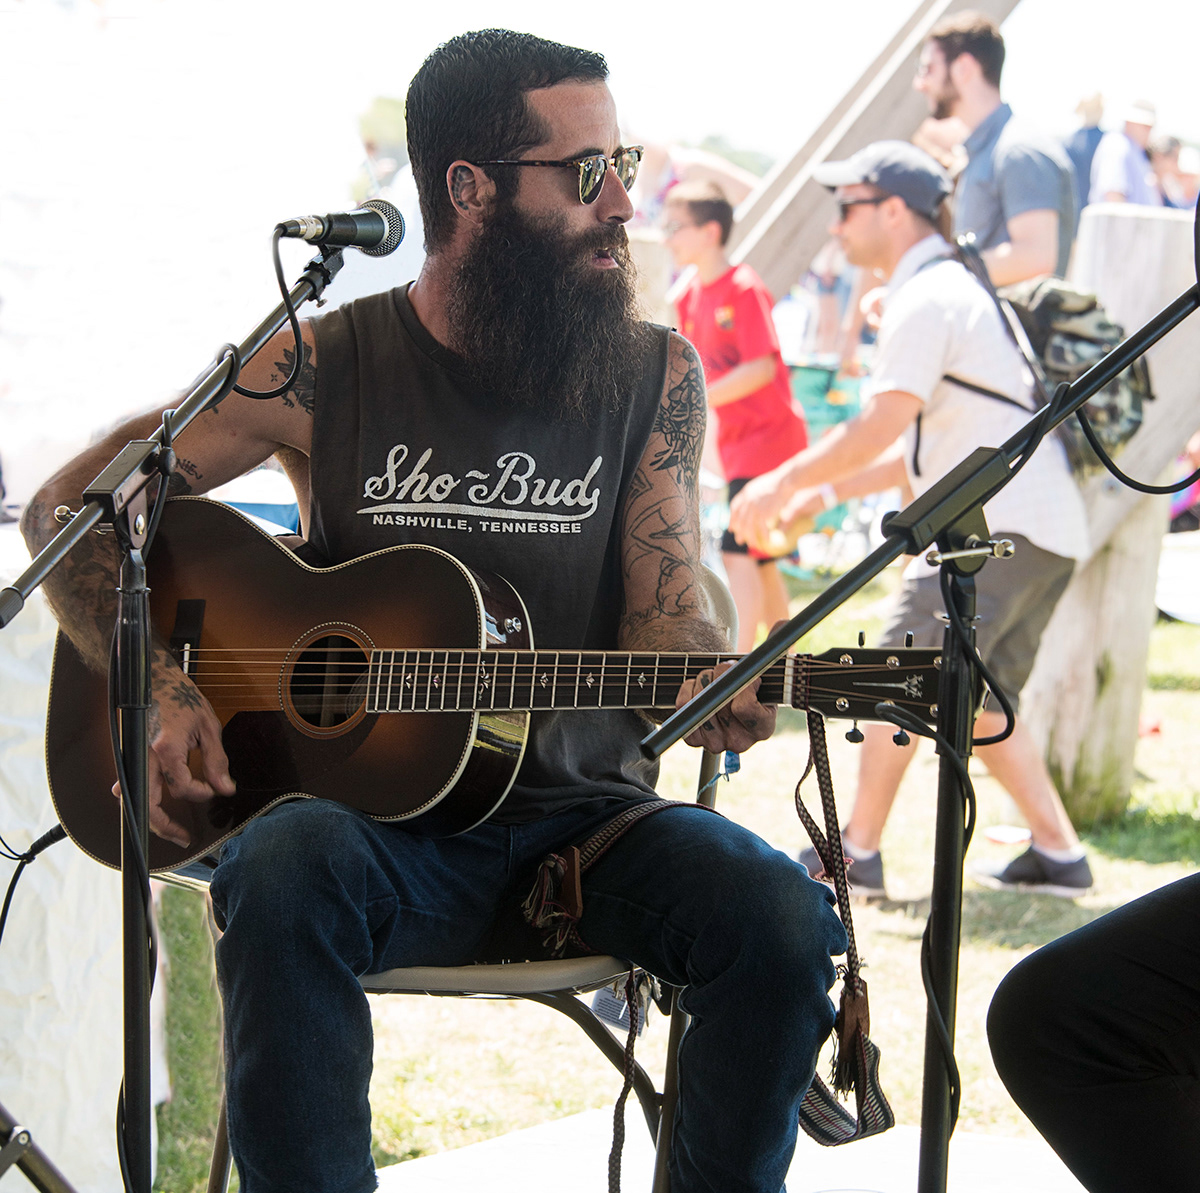 guitar bands festivals music Photography  guitarists